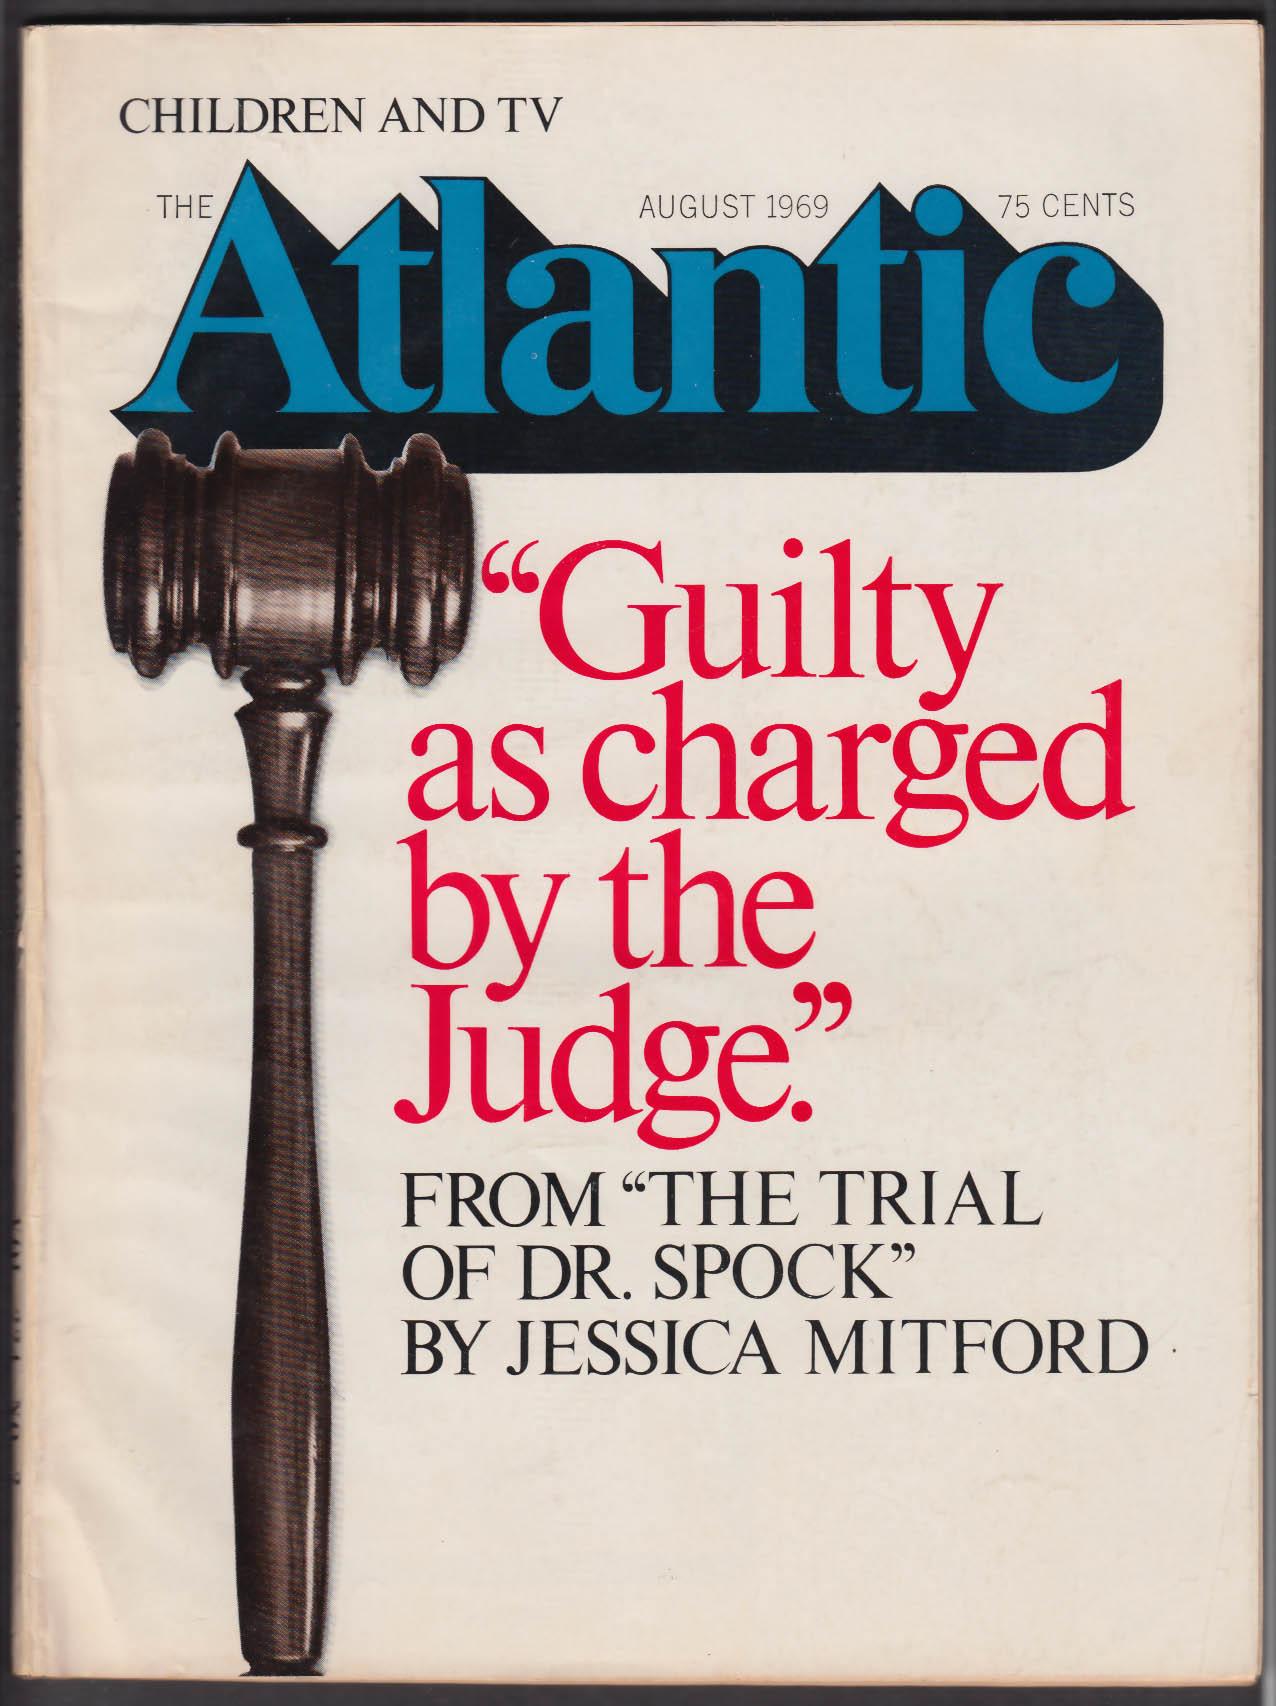 ATLANTIC Mitford on Trial of Dr Spock Herbert Gold Robert Jay Lifton ++ 8 1969